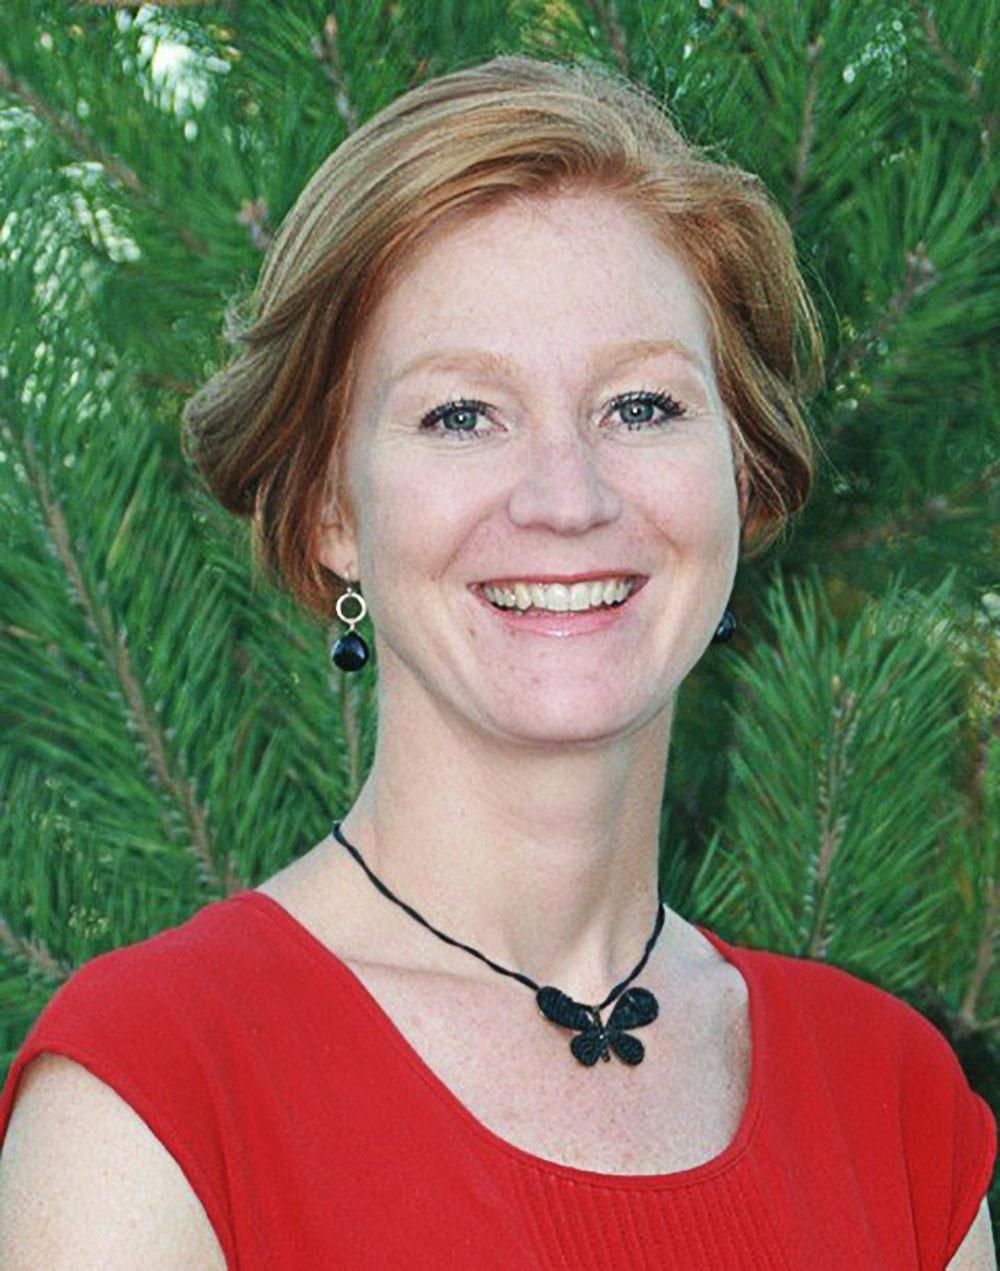 Virginie de Visscher, CITP|FIBP — Director of International Trade